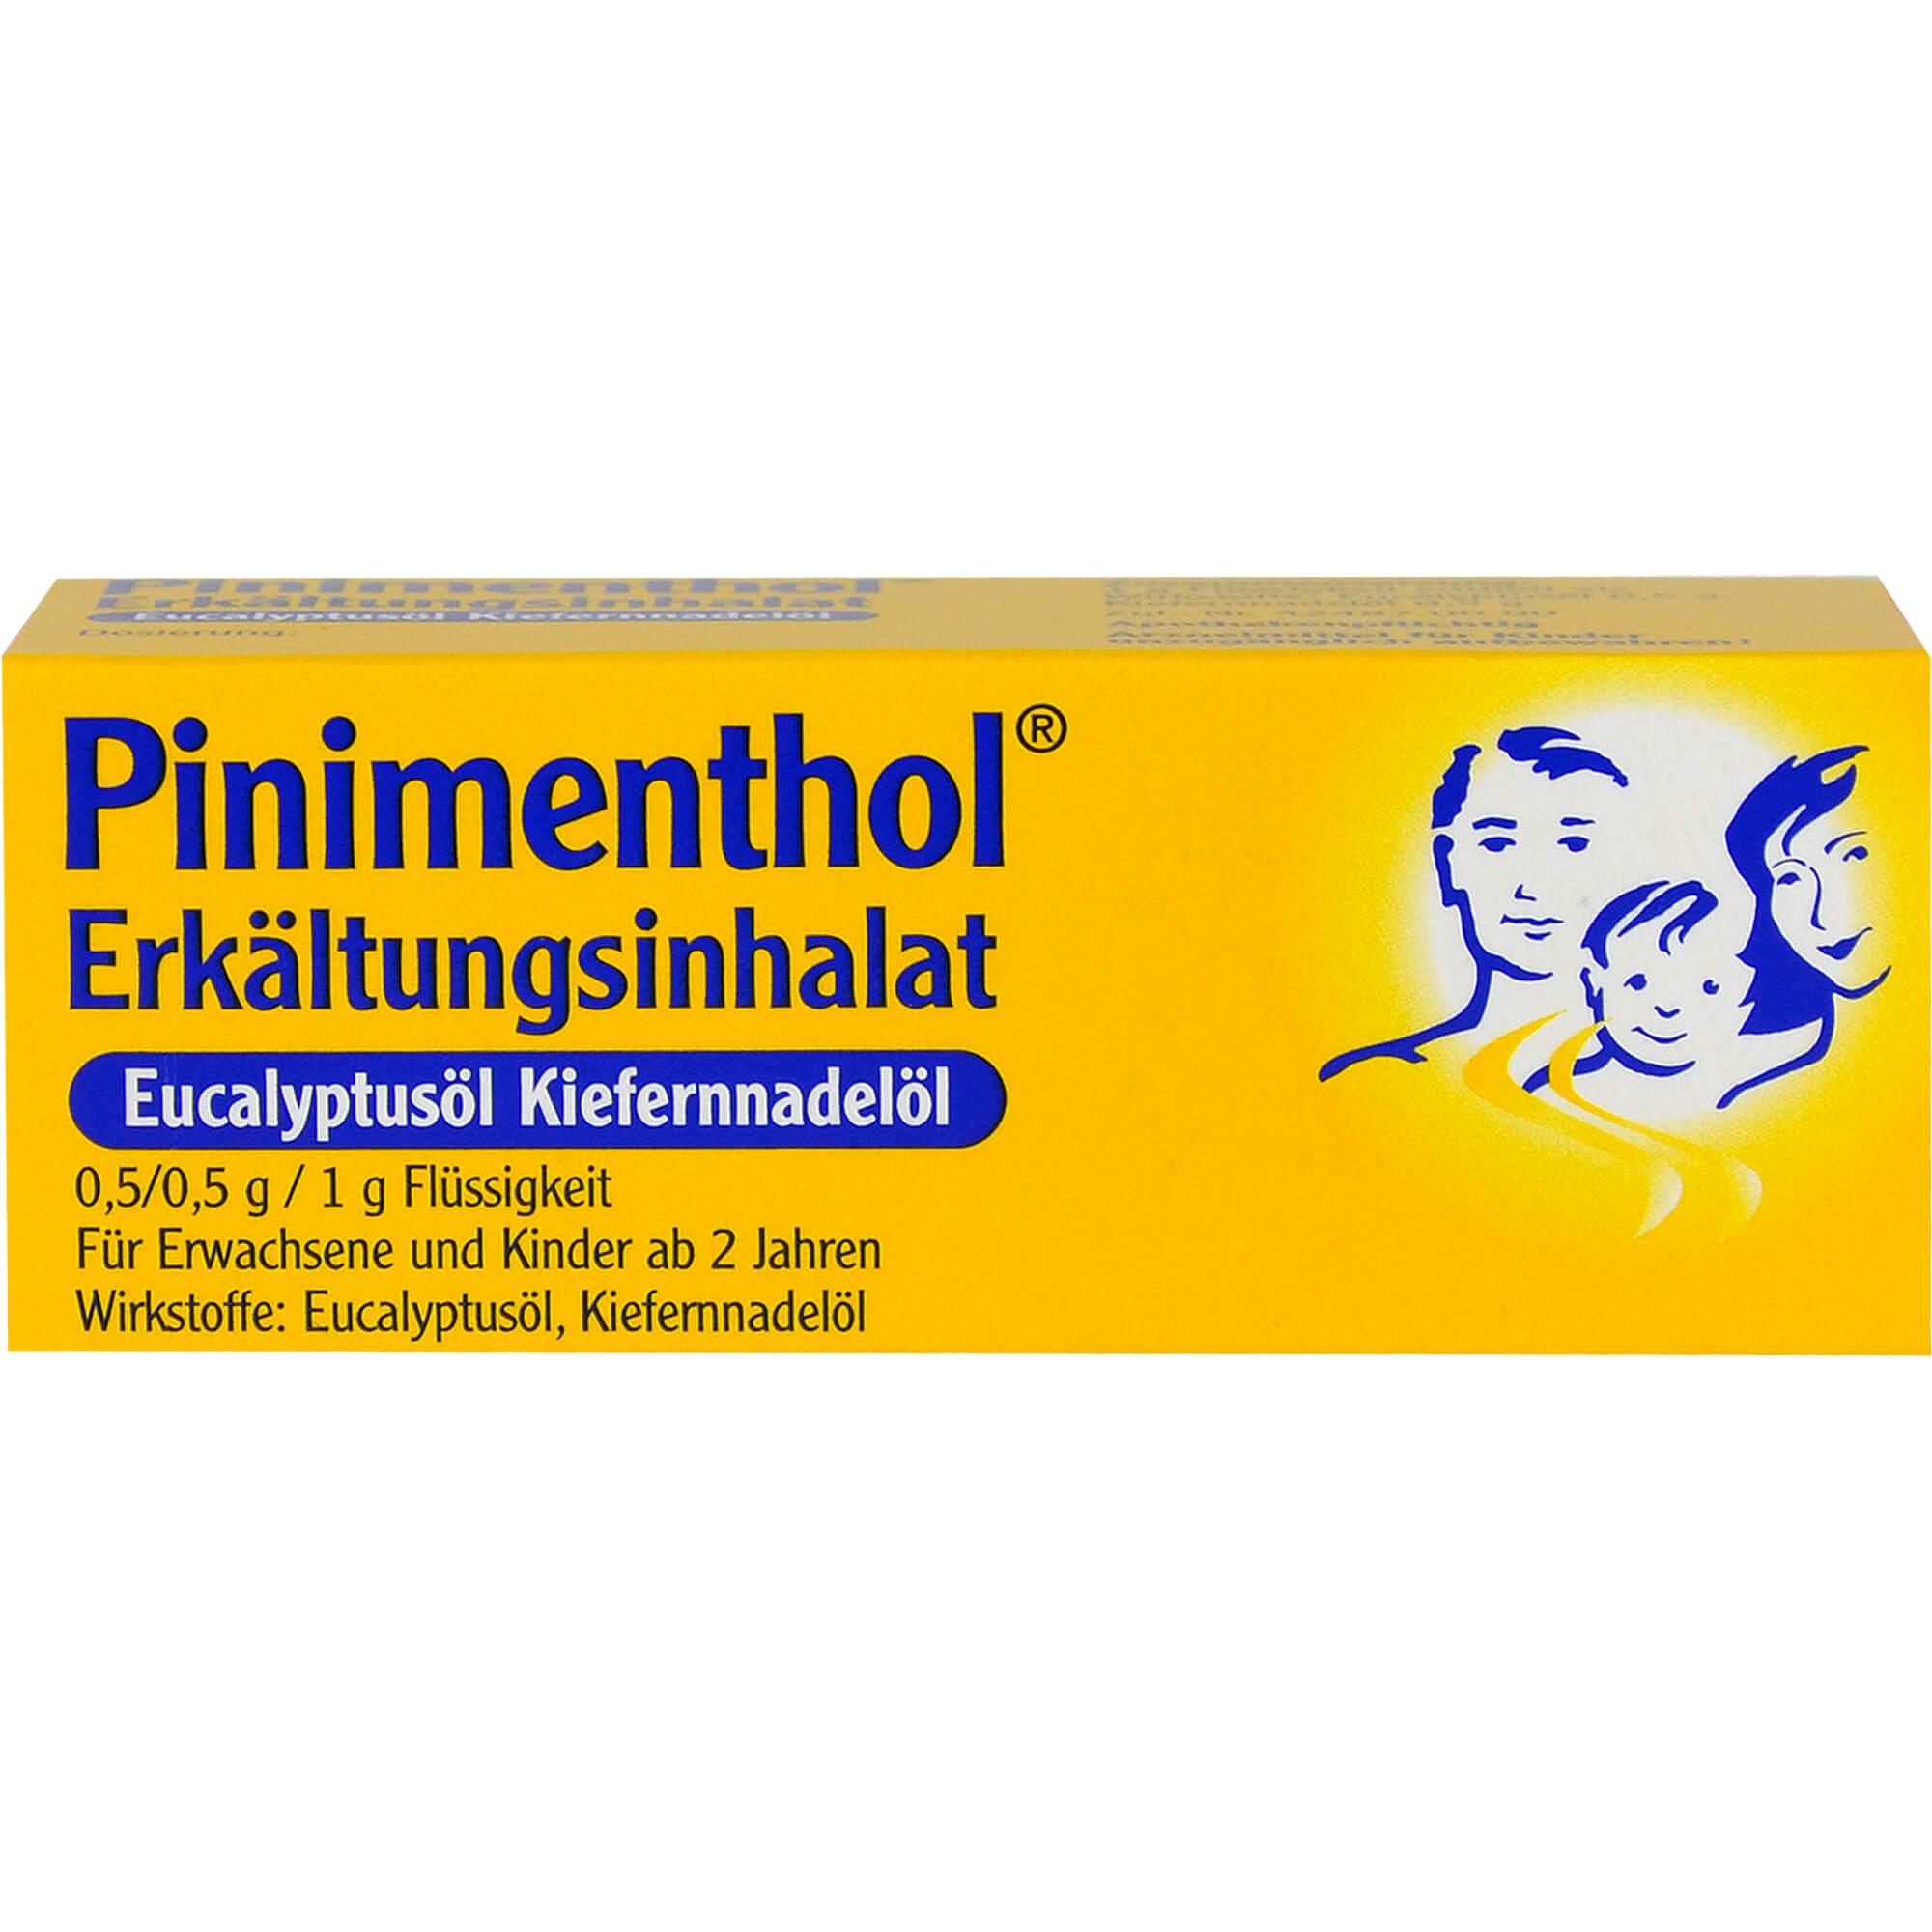 PINIMENTHOL-Erkaelt-Inhalat-Eucal-Kiefernadeloel